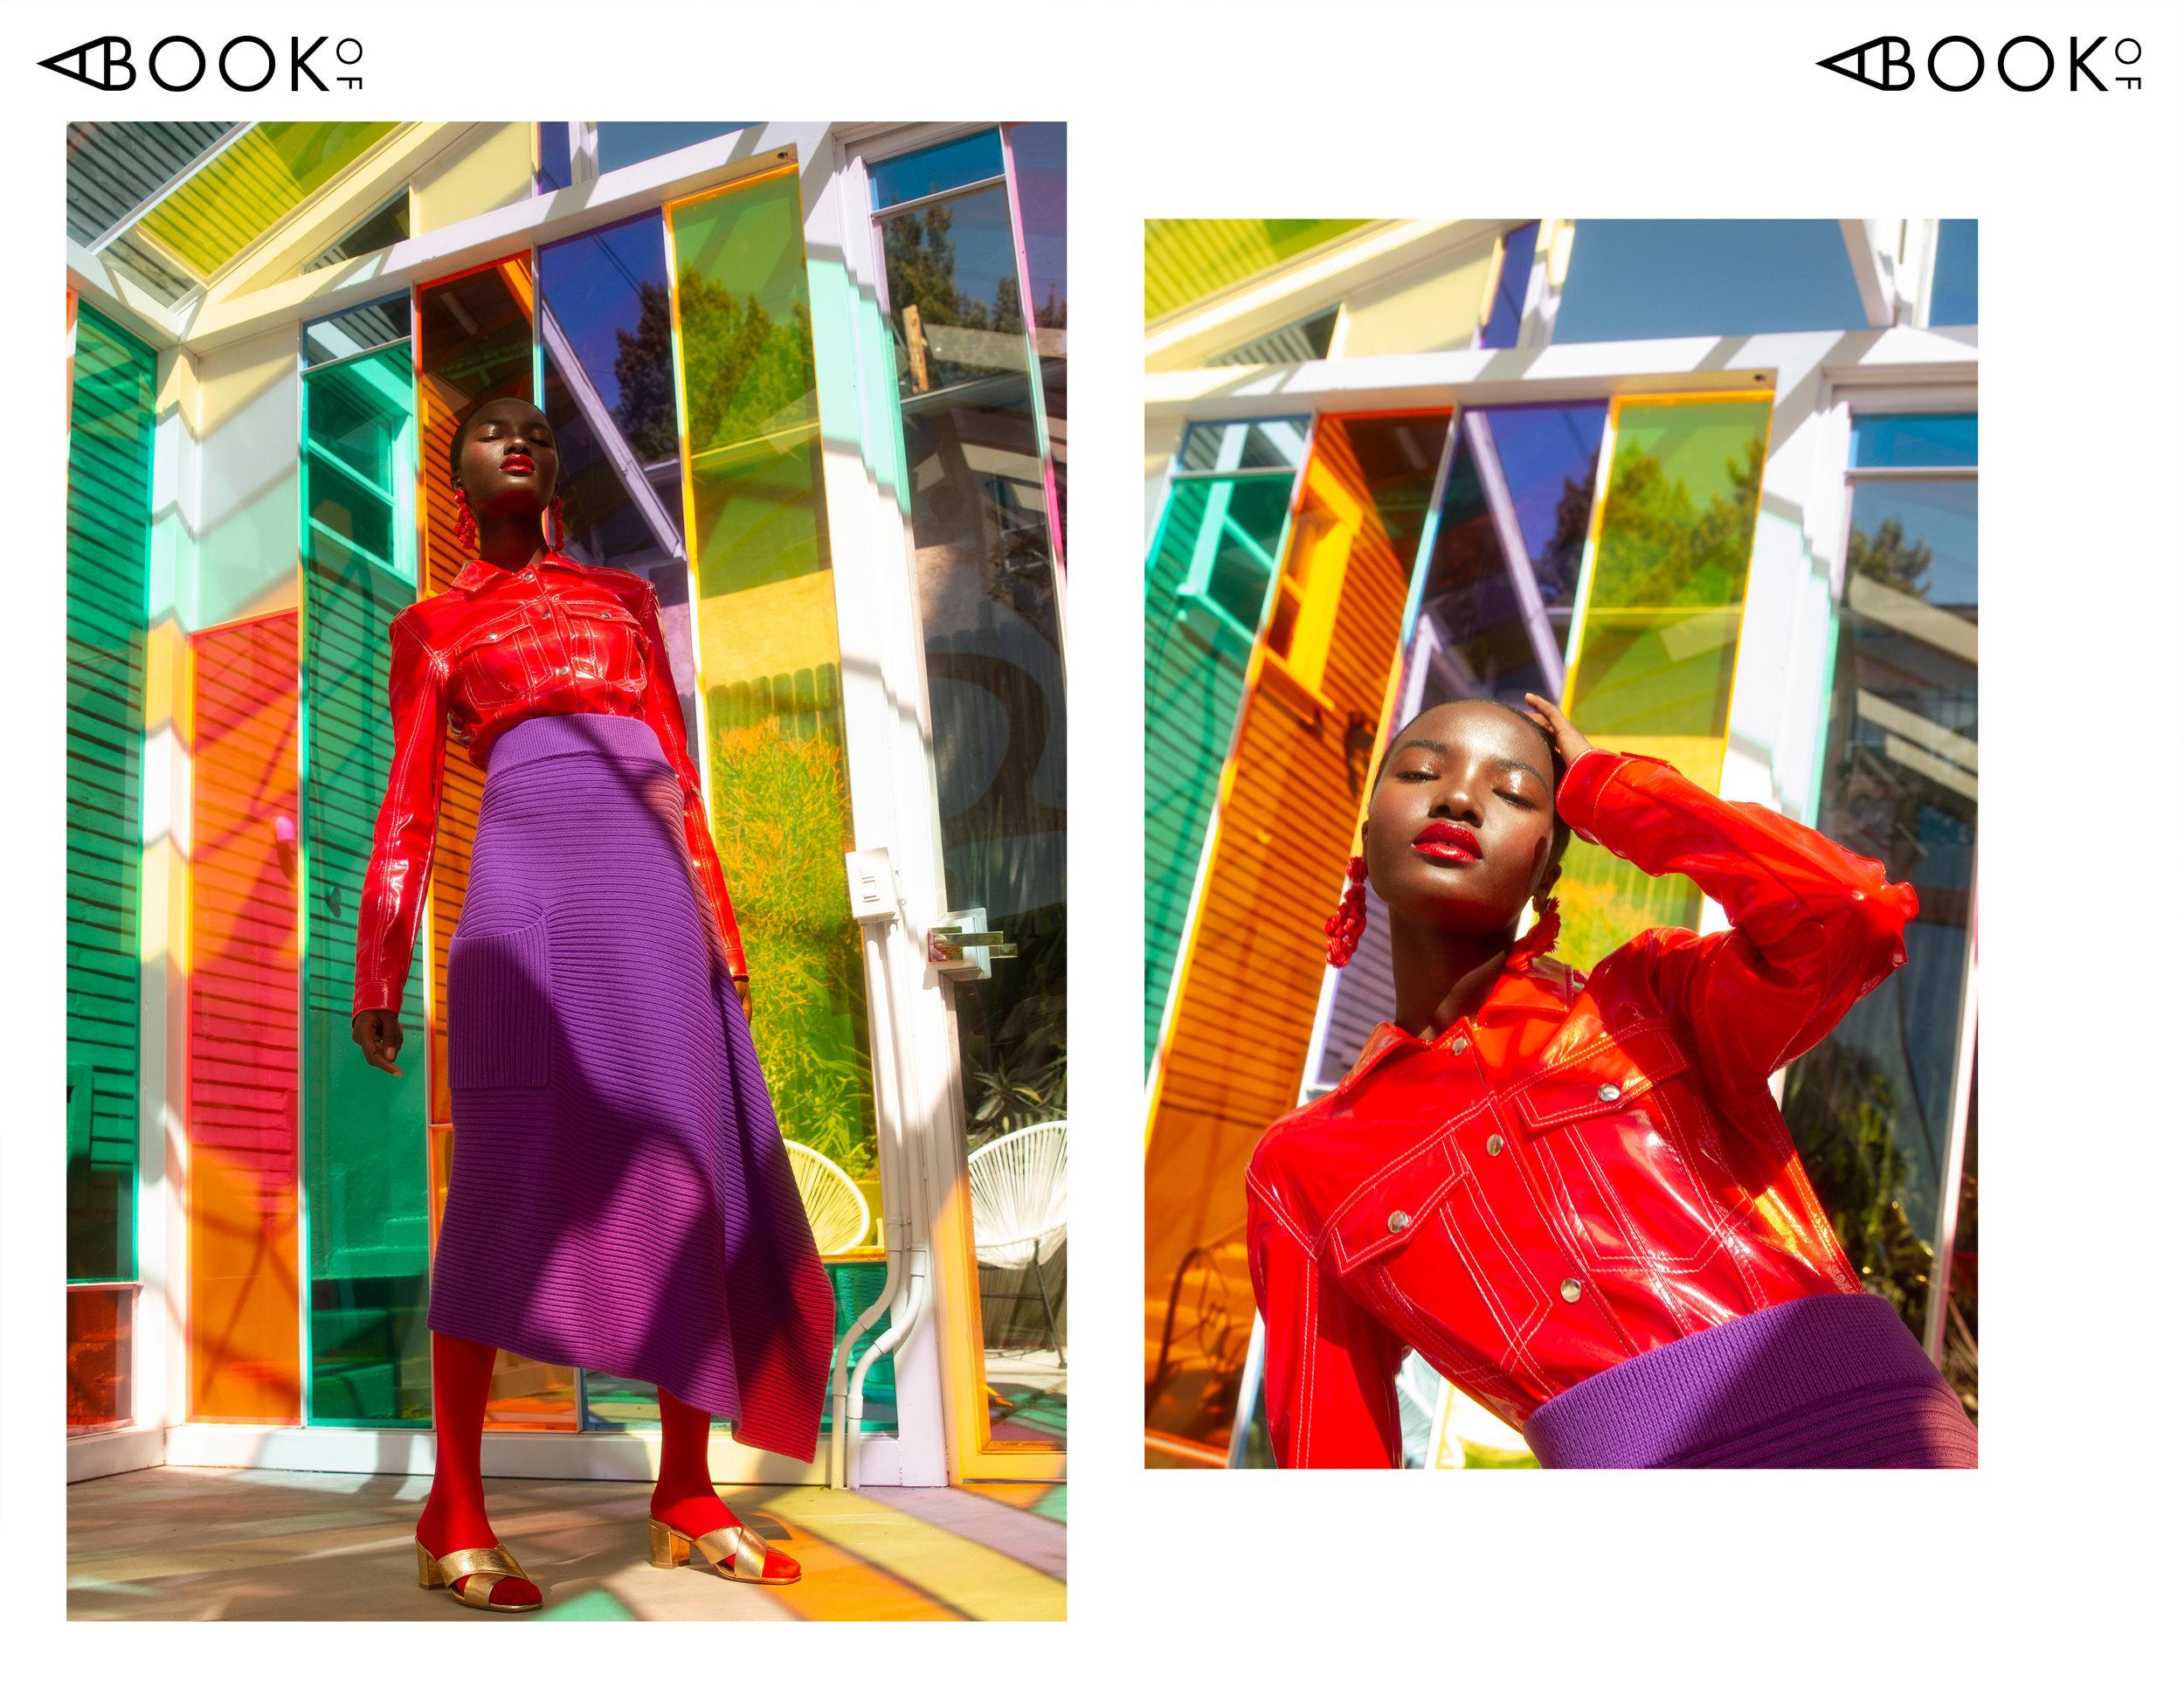 Jacket: Stinson Haus | Skirt: Tibi | Shoes: Charlotte Stone | Earrings: J.Crew